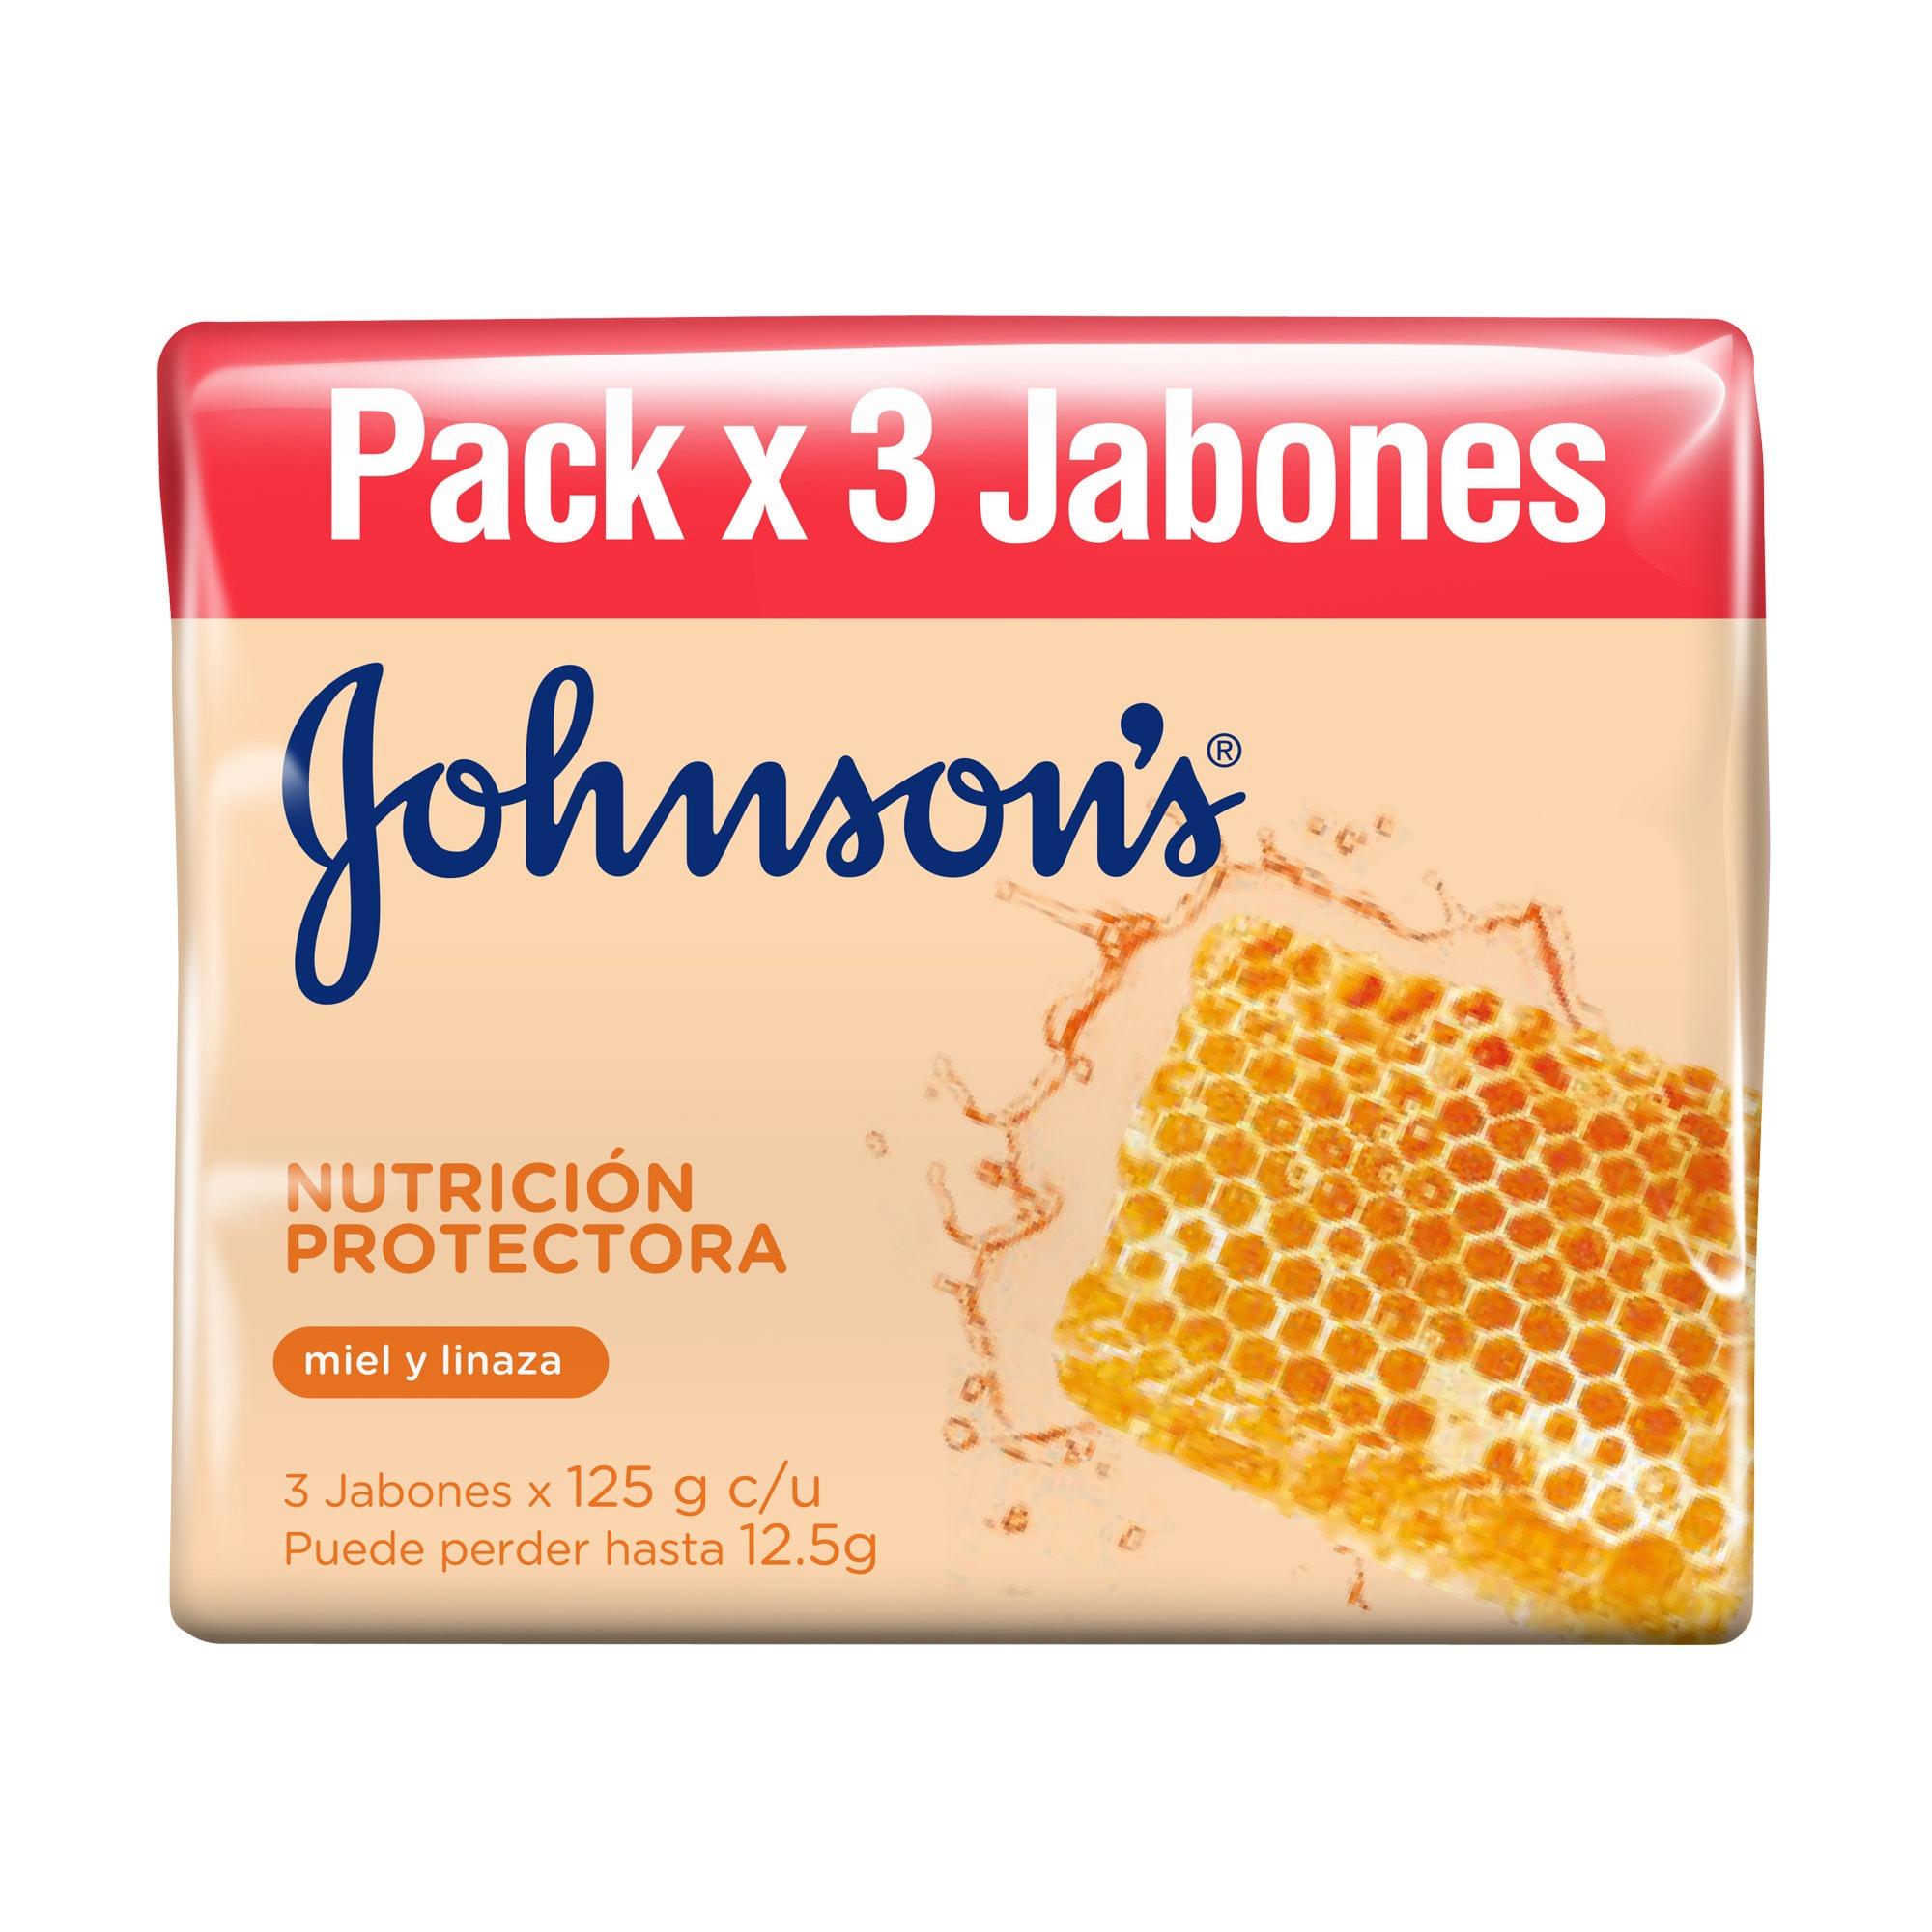 JABON NUTR PROT JOHNSONS 3UN 125GR PACK